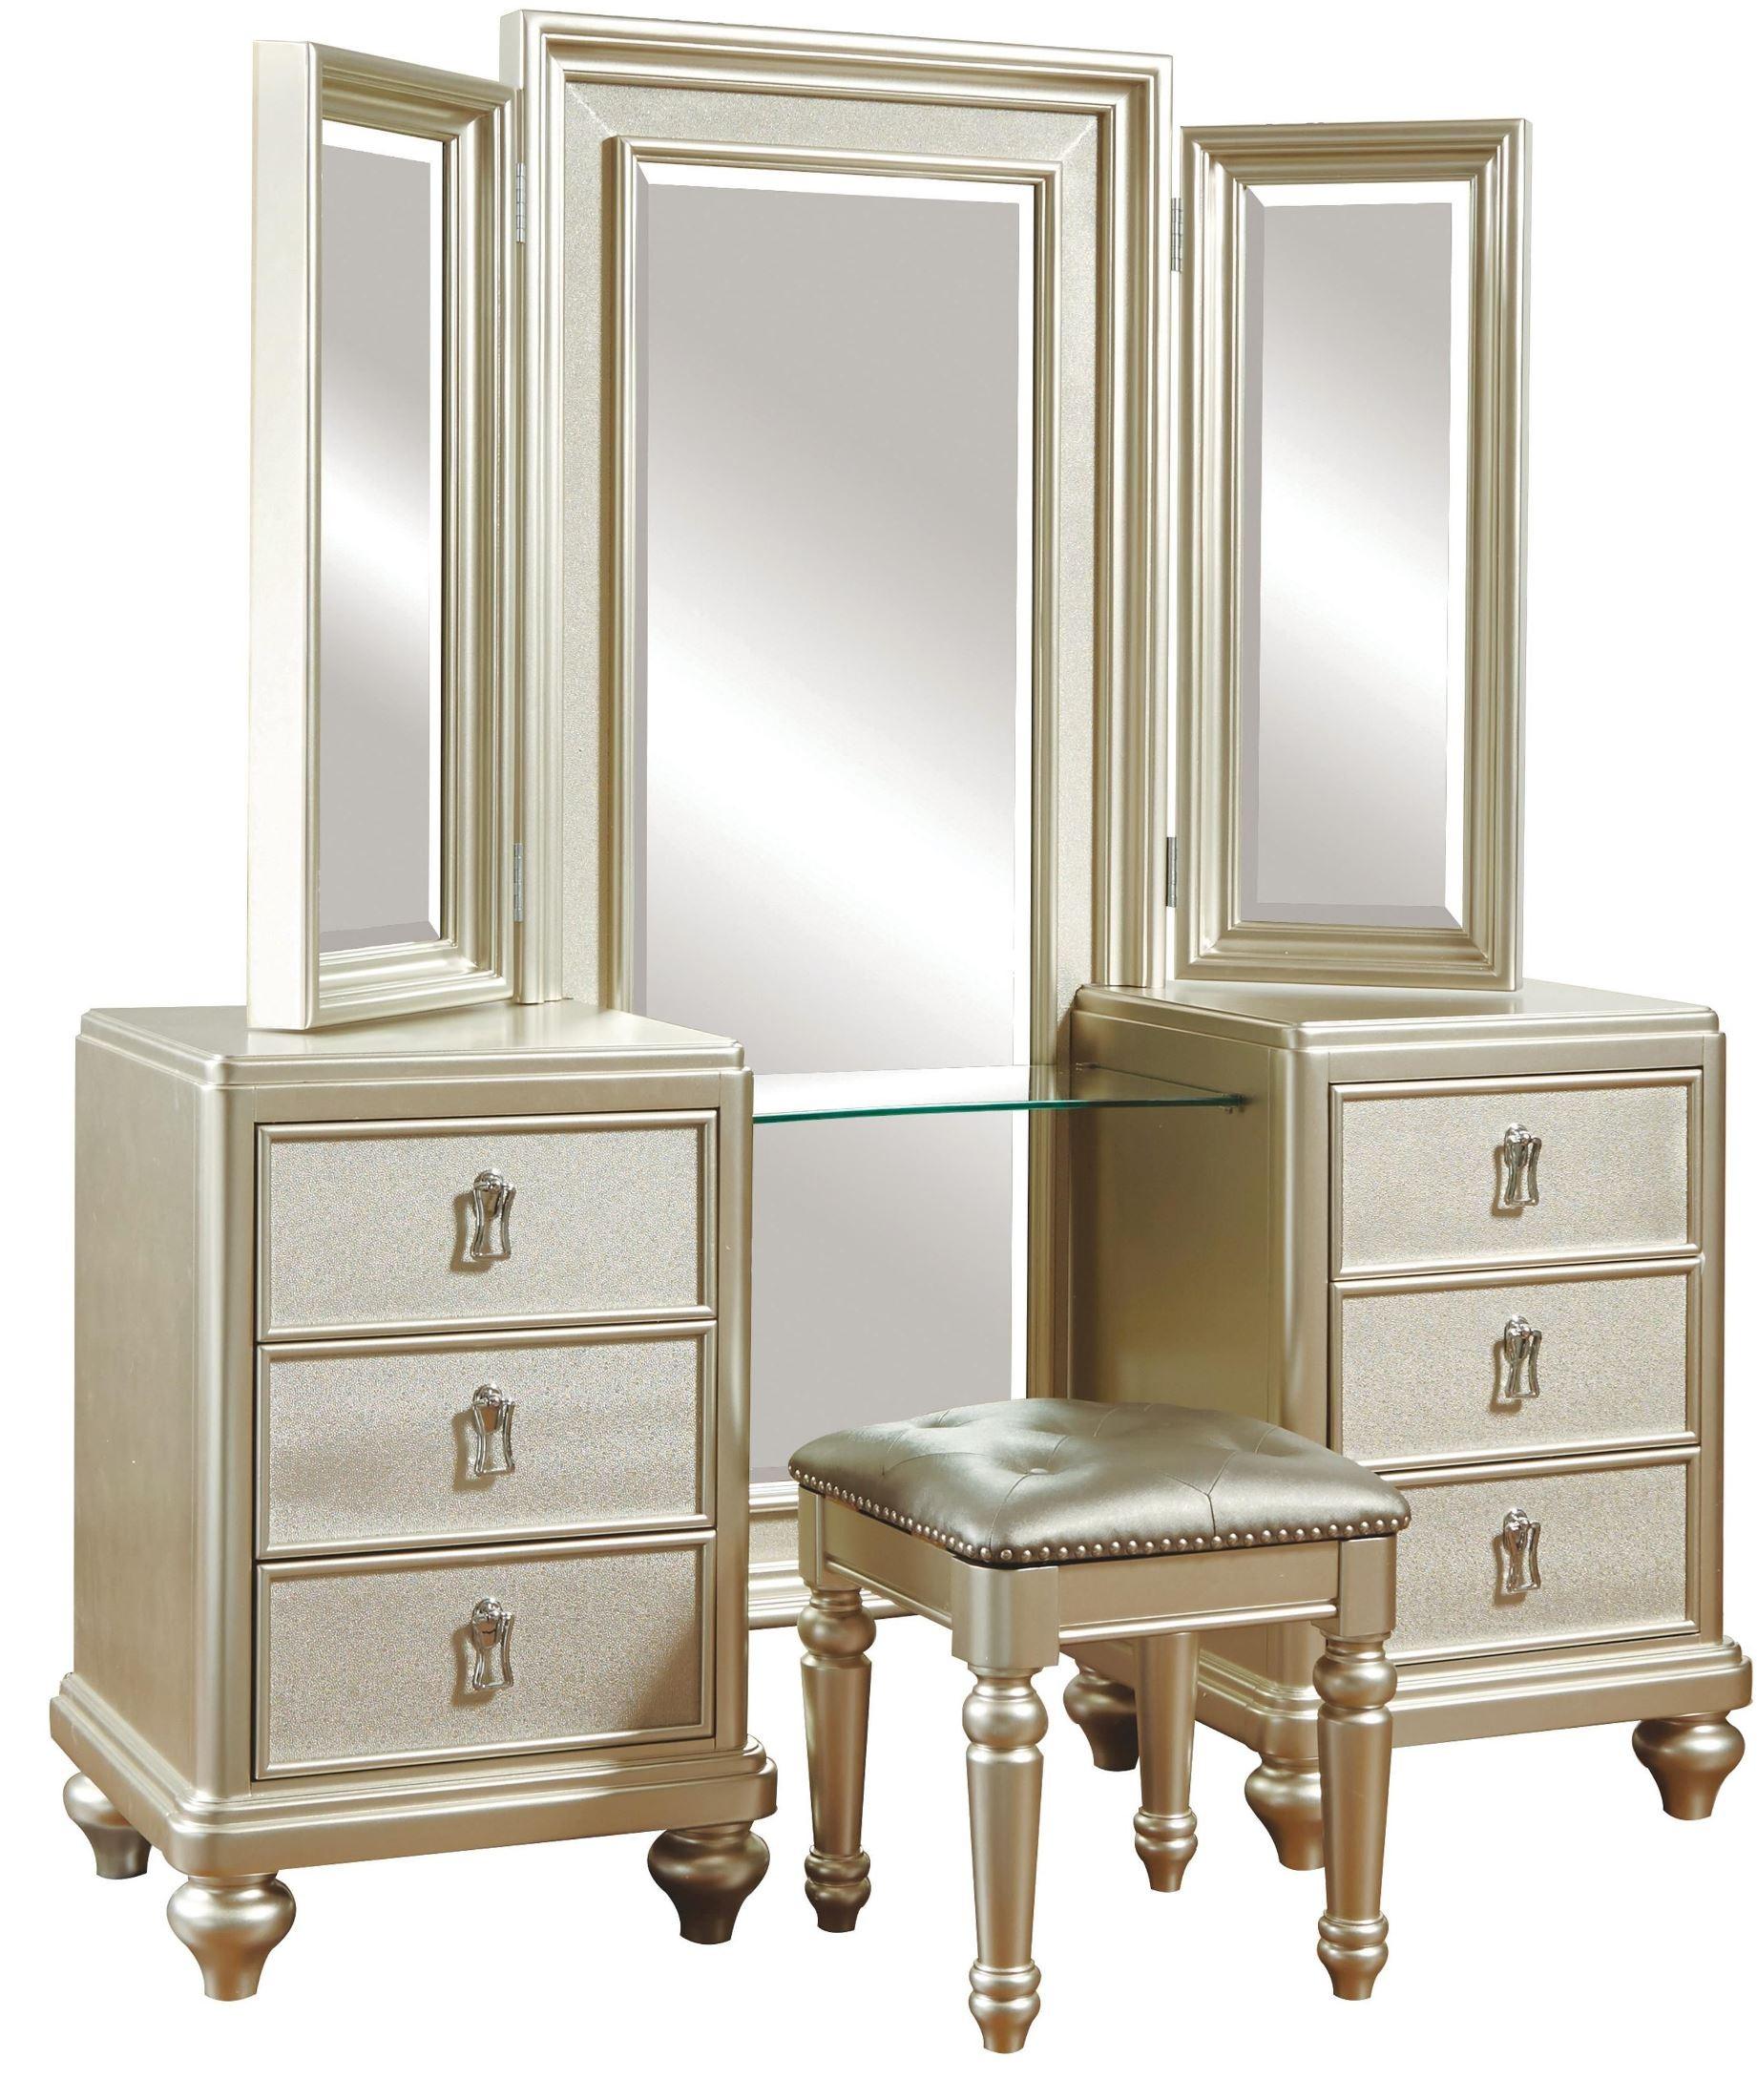 Diva Metallic Vanity Dresser with stool from Samuel Lawrence 8808012  Coleman Furniture